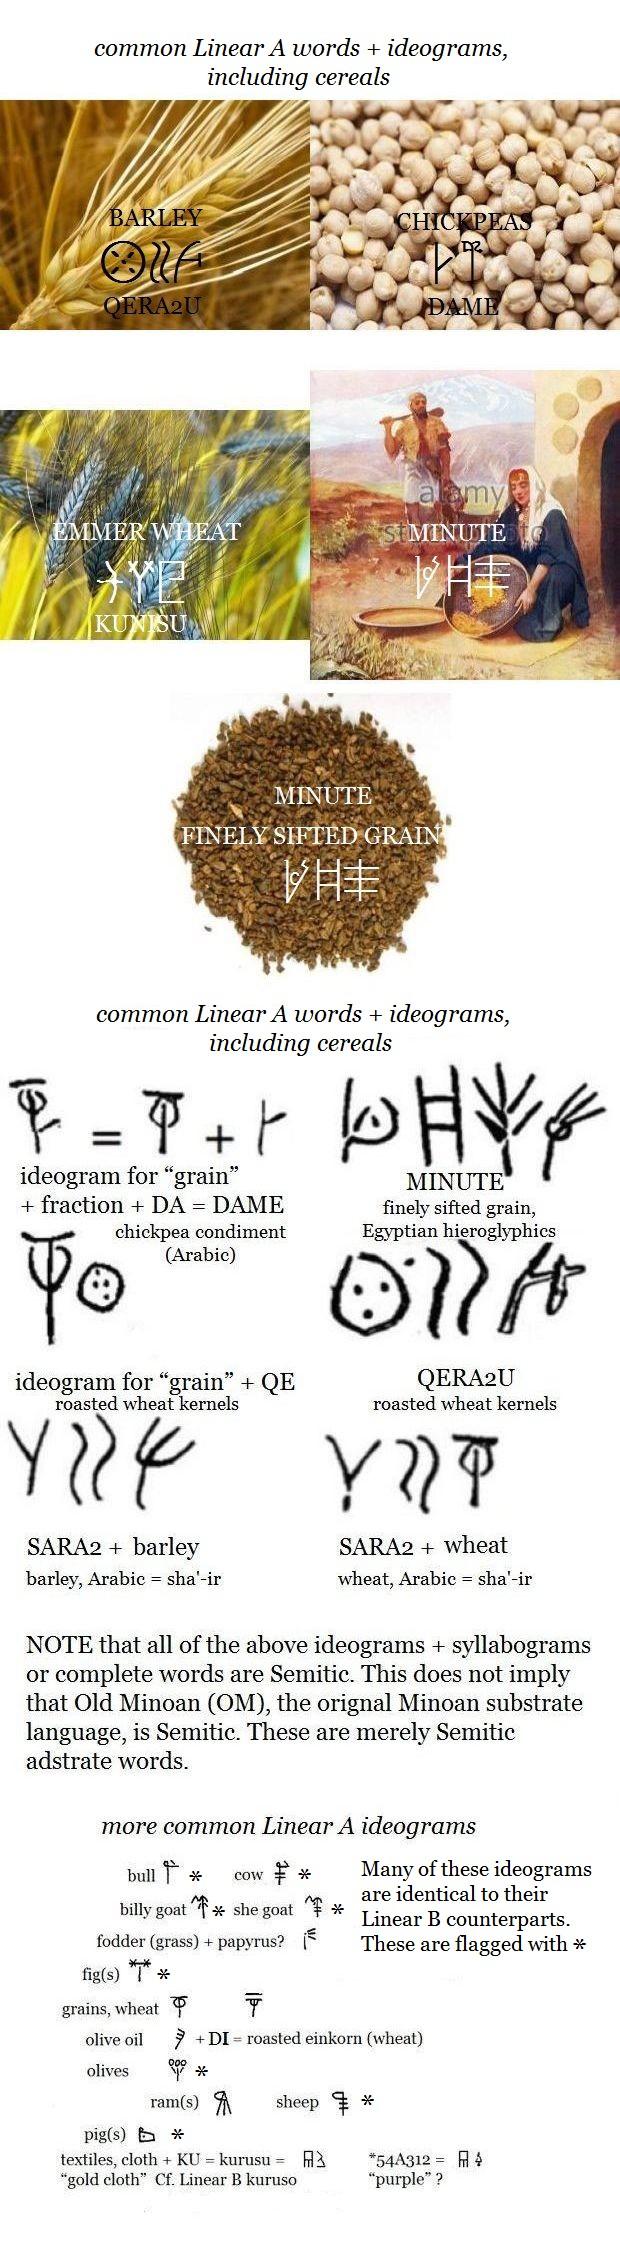 all Linear A ideograms grains